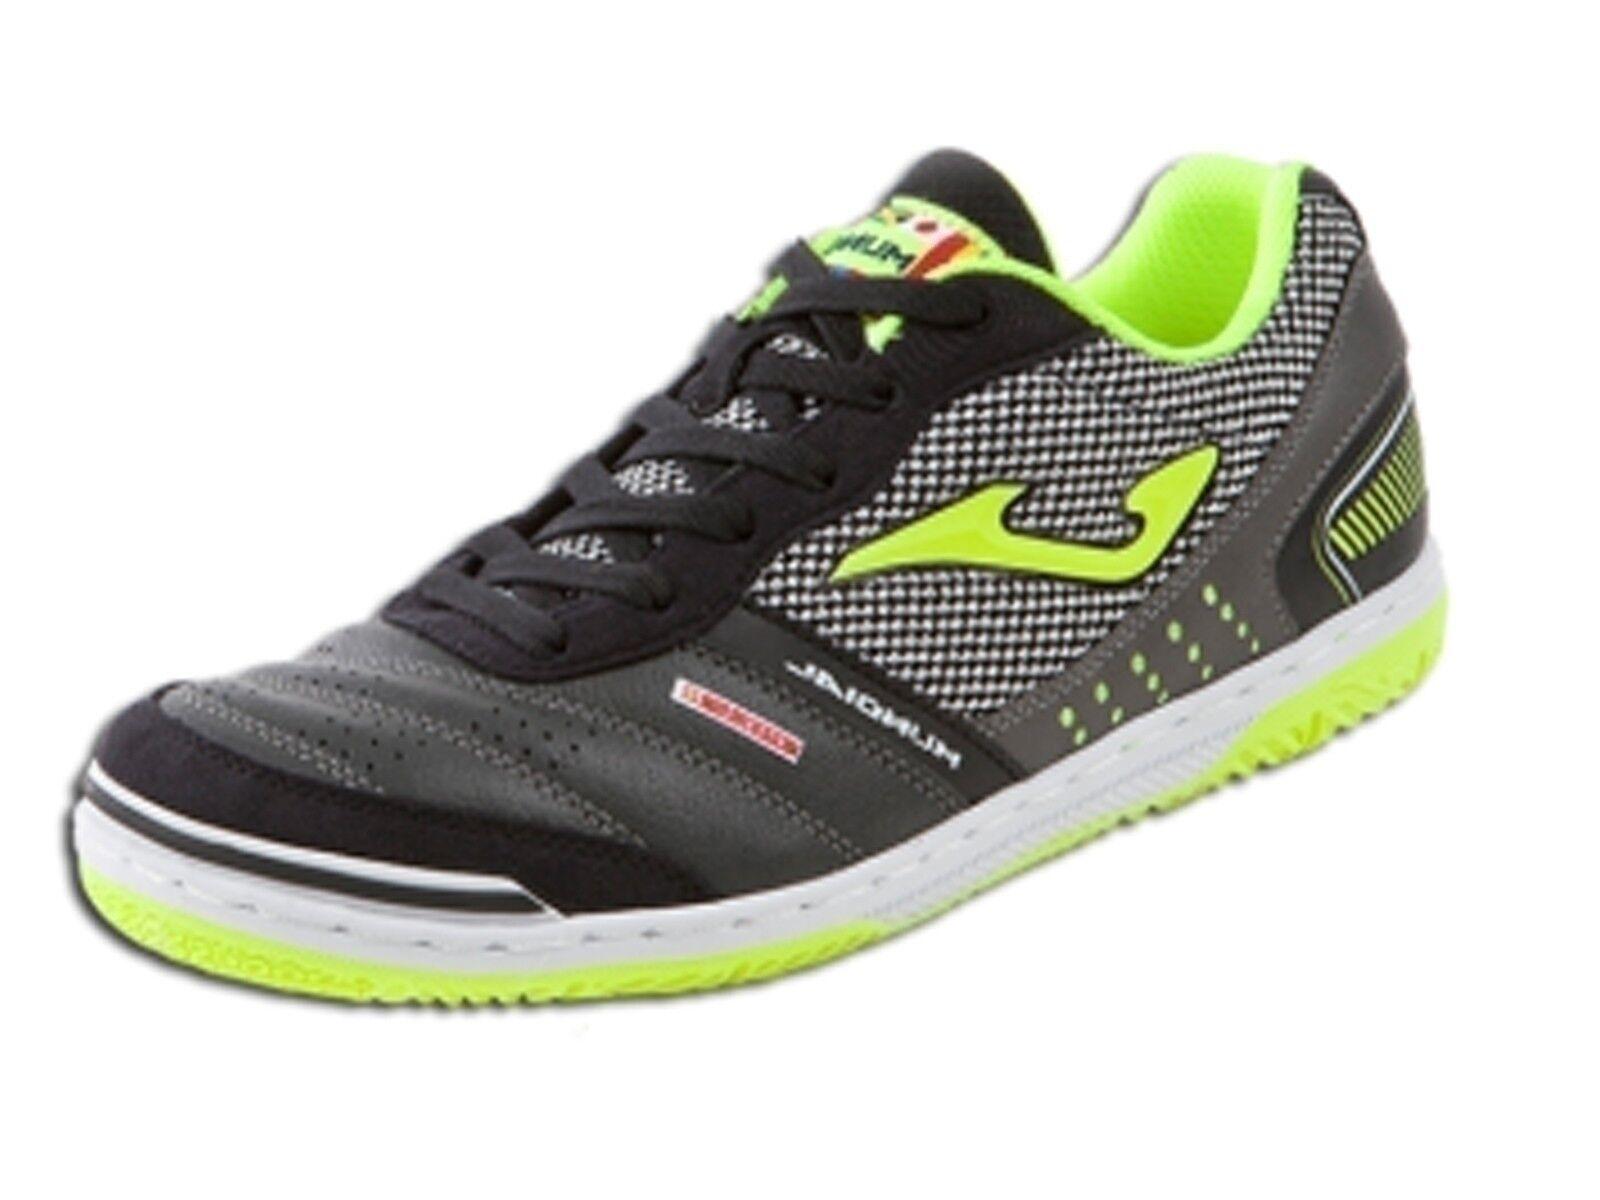 zapatos CALCETTO hombres JOMA  MUNW.712.IN  MUNDIAL 712 INDOOR gris